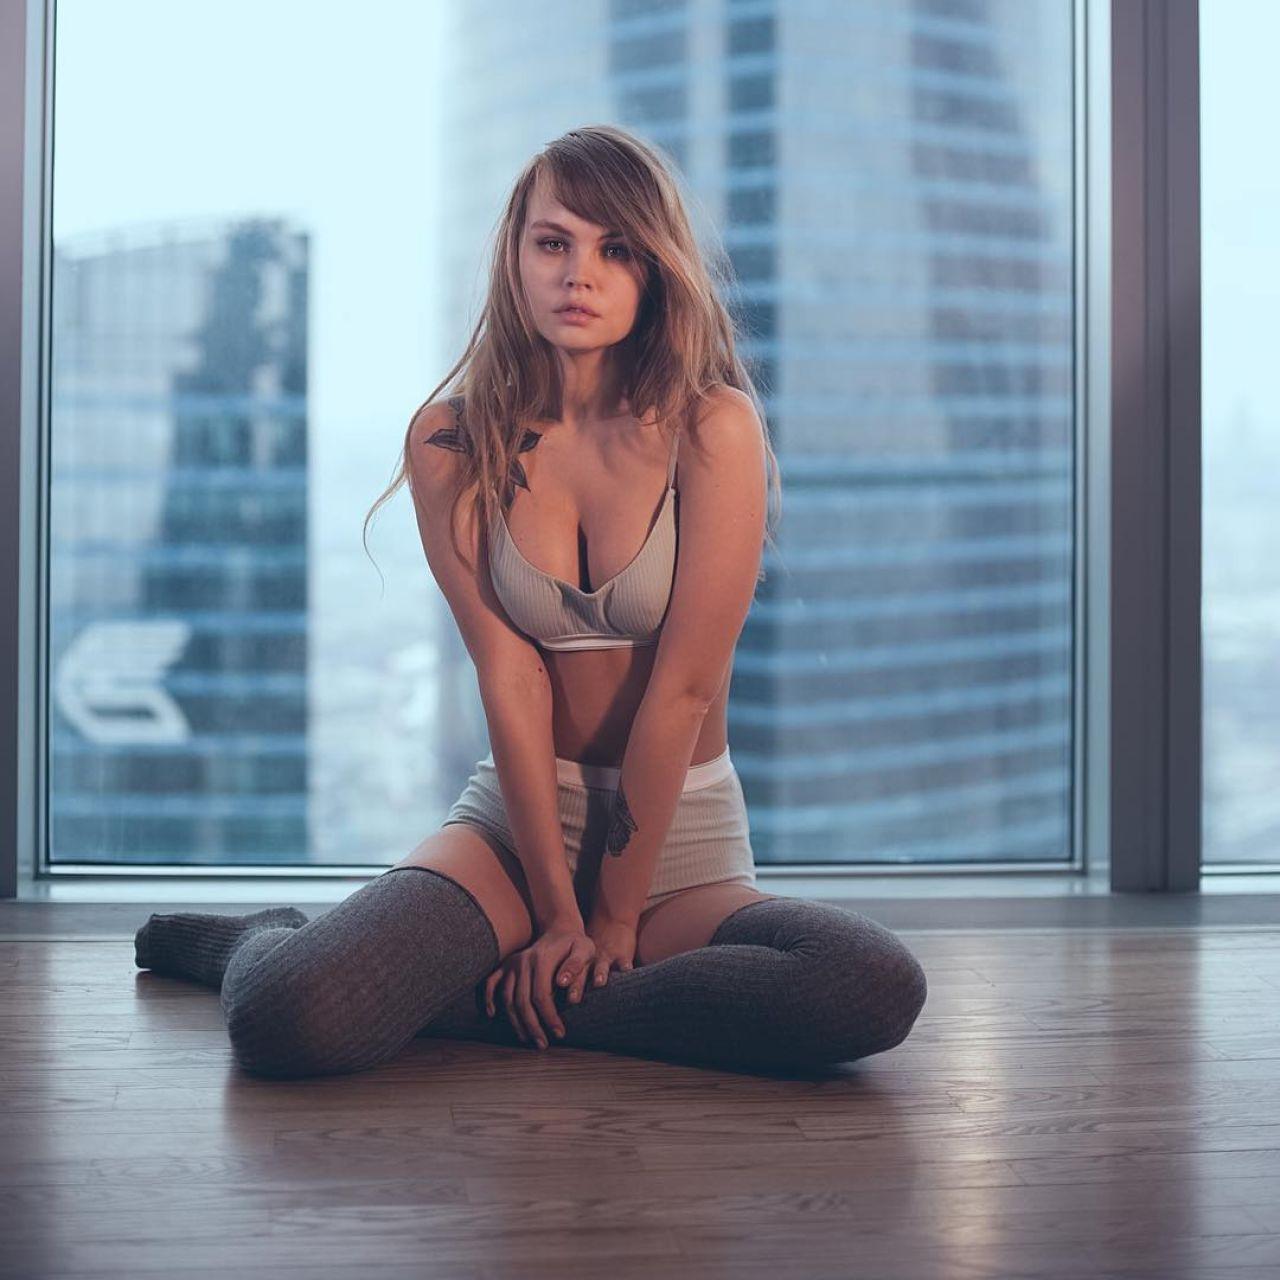 Bikini Anastasiya Scheglova naked (88 photo), Pussy, Paparazzi, Twitter, see through 2020